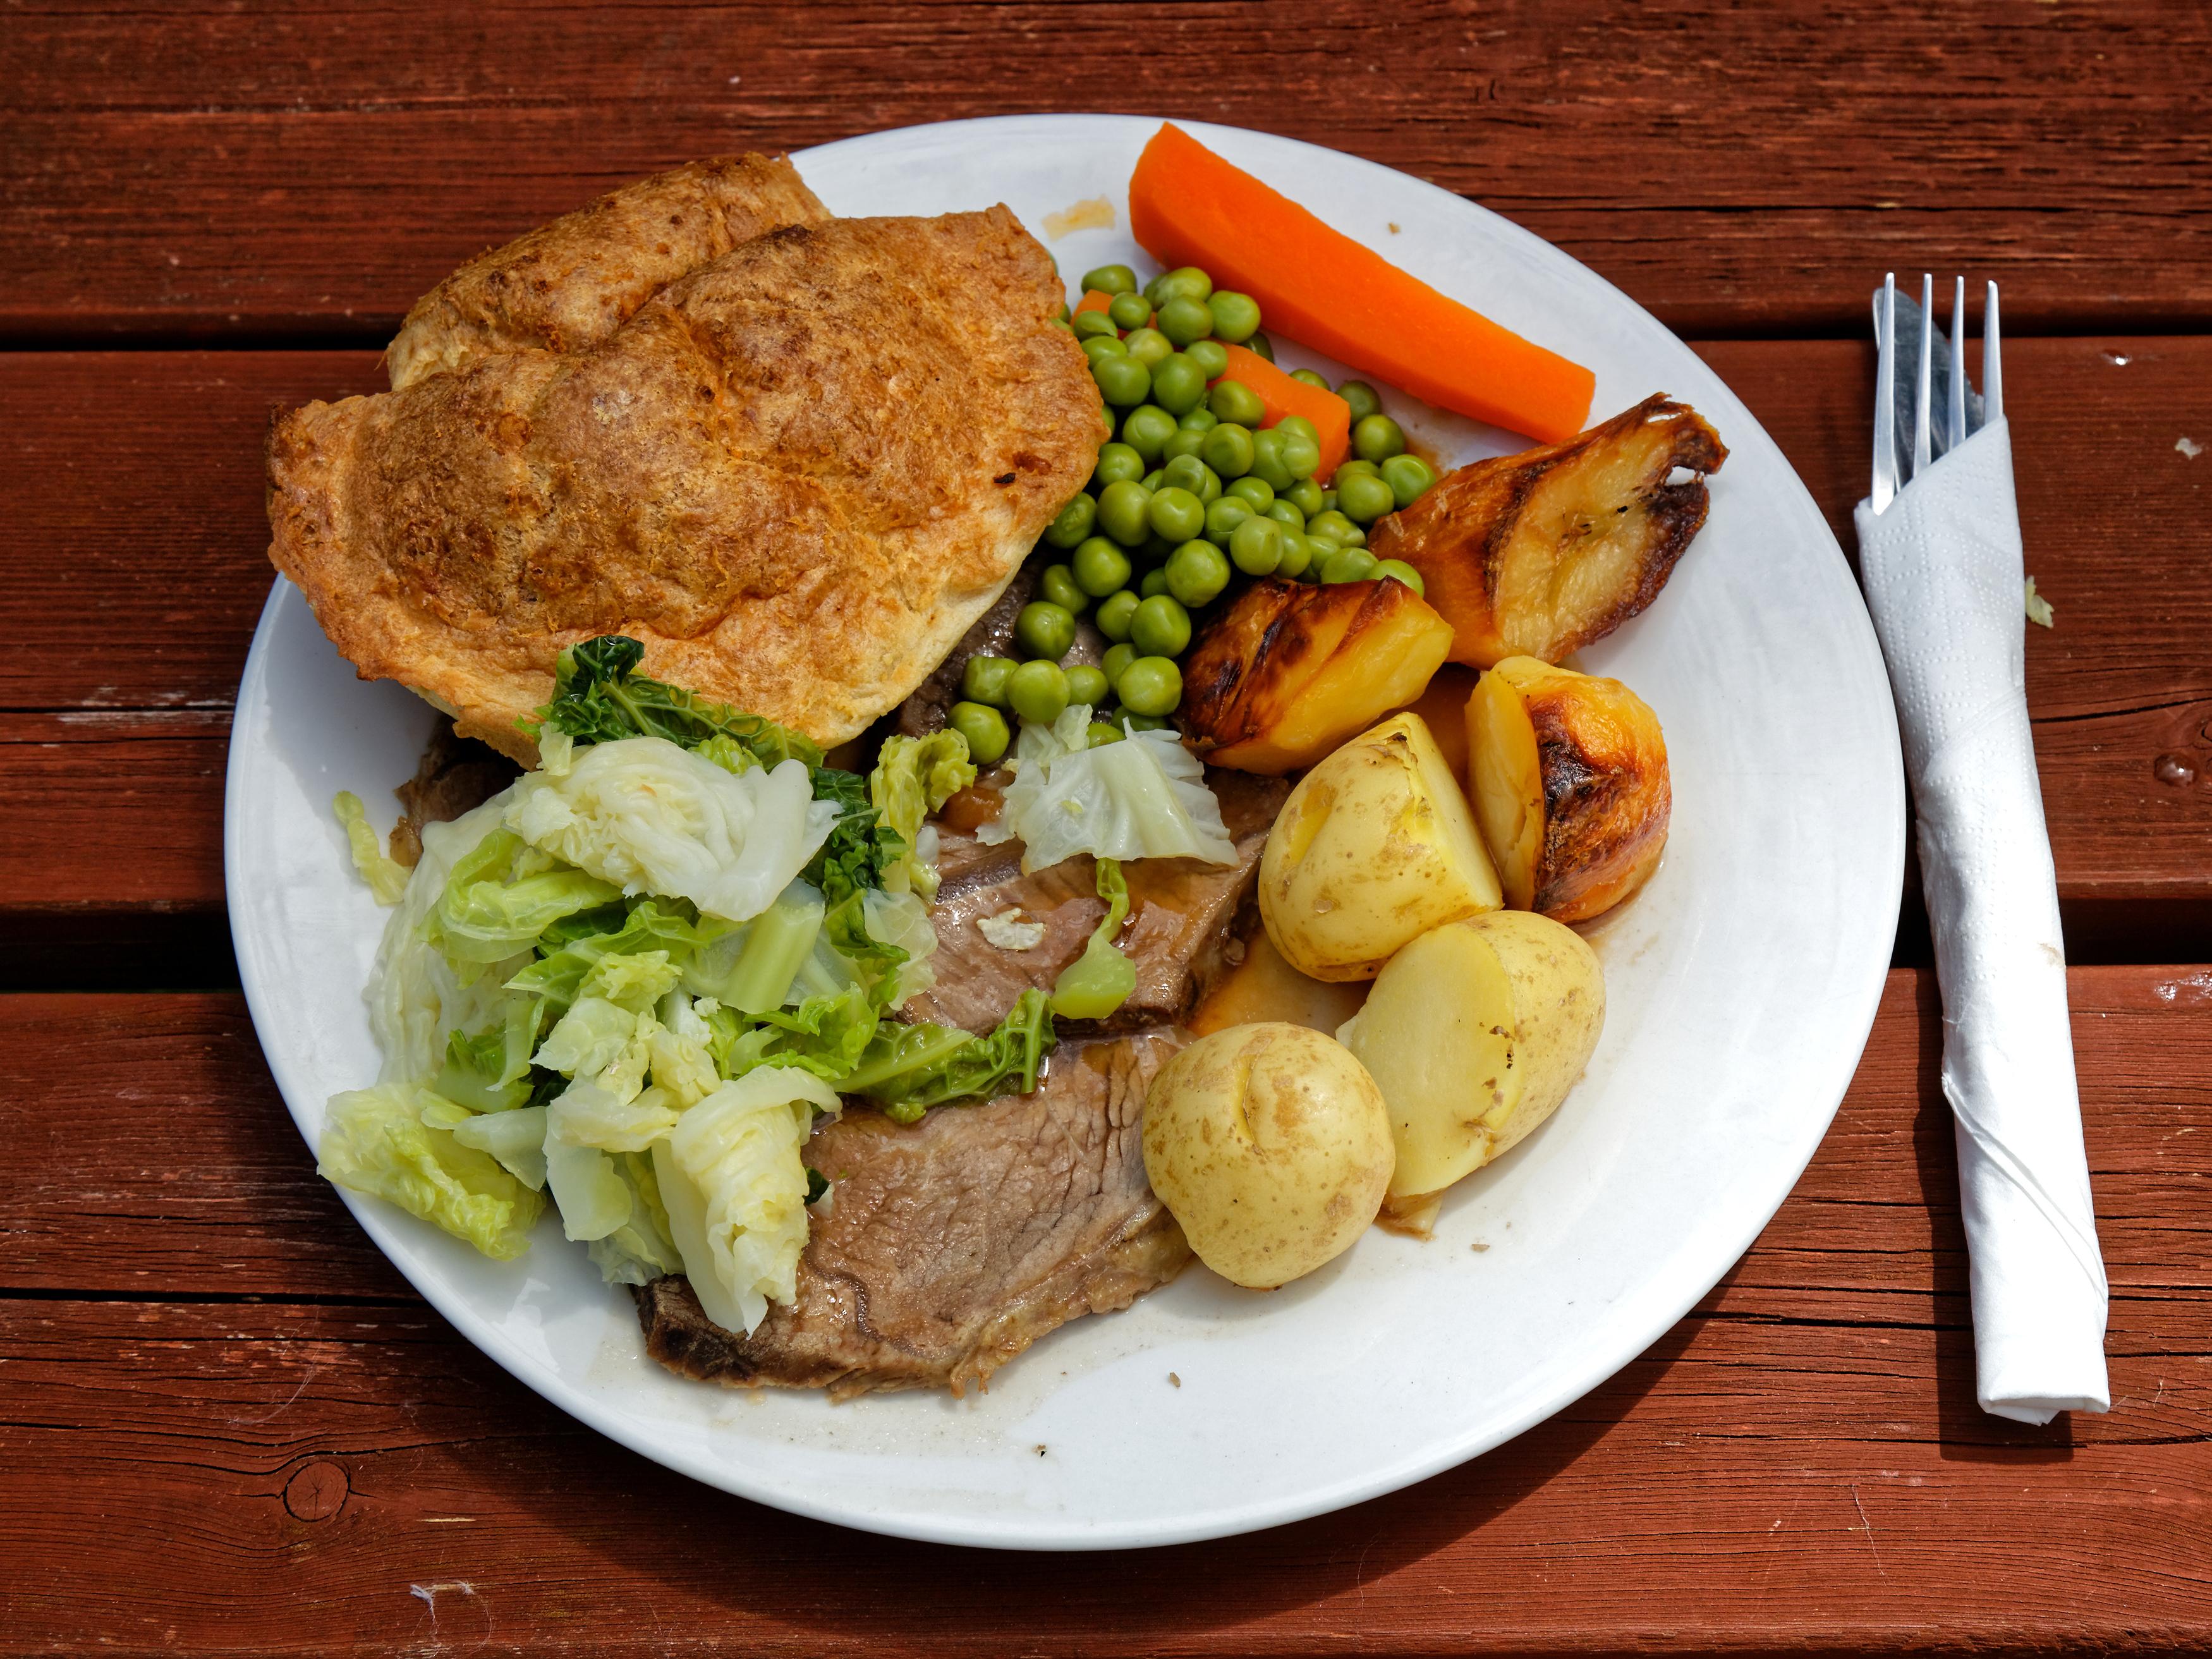 dinner england roast beef queen head essex boreham lighter file wikimedia commons spain pixels torremolinos eat places confusing bring description